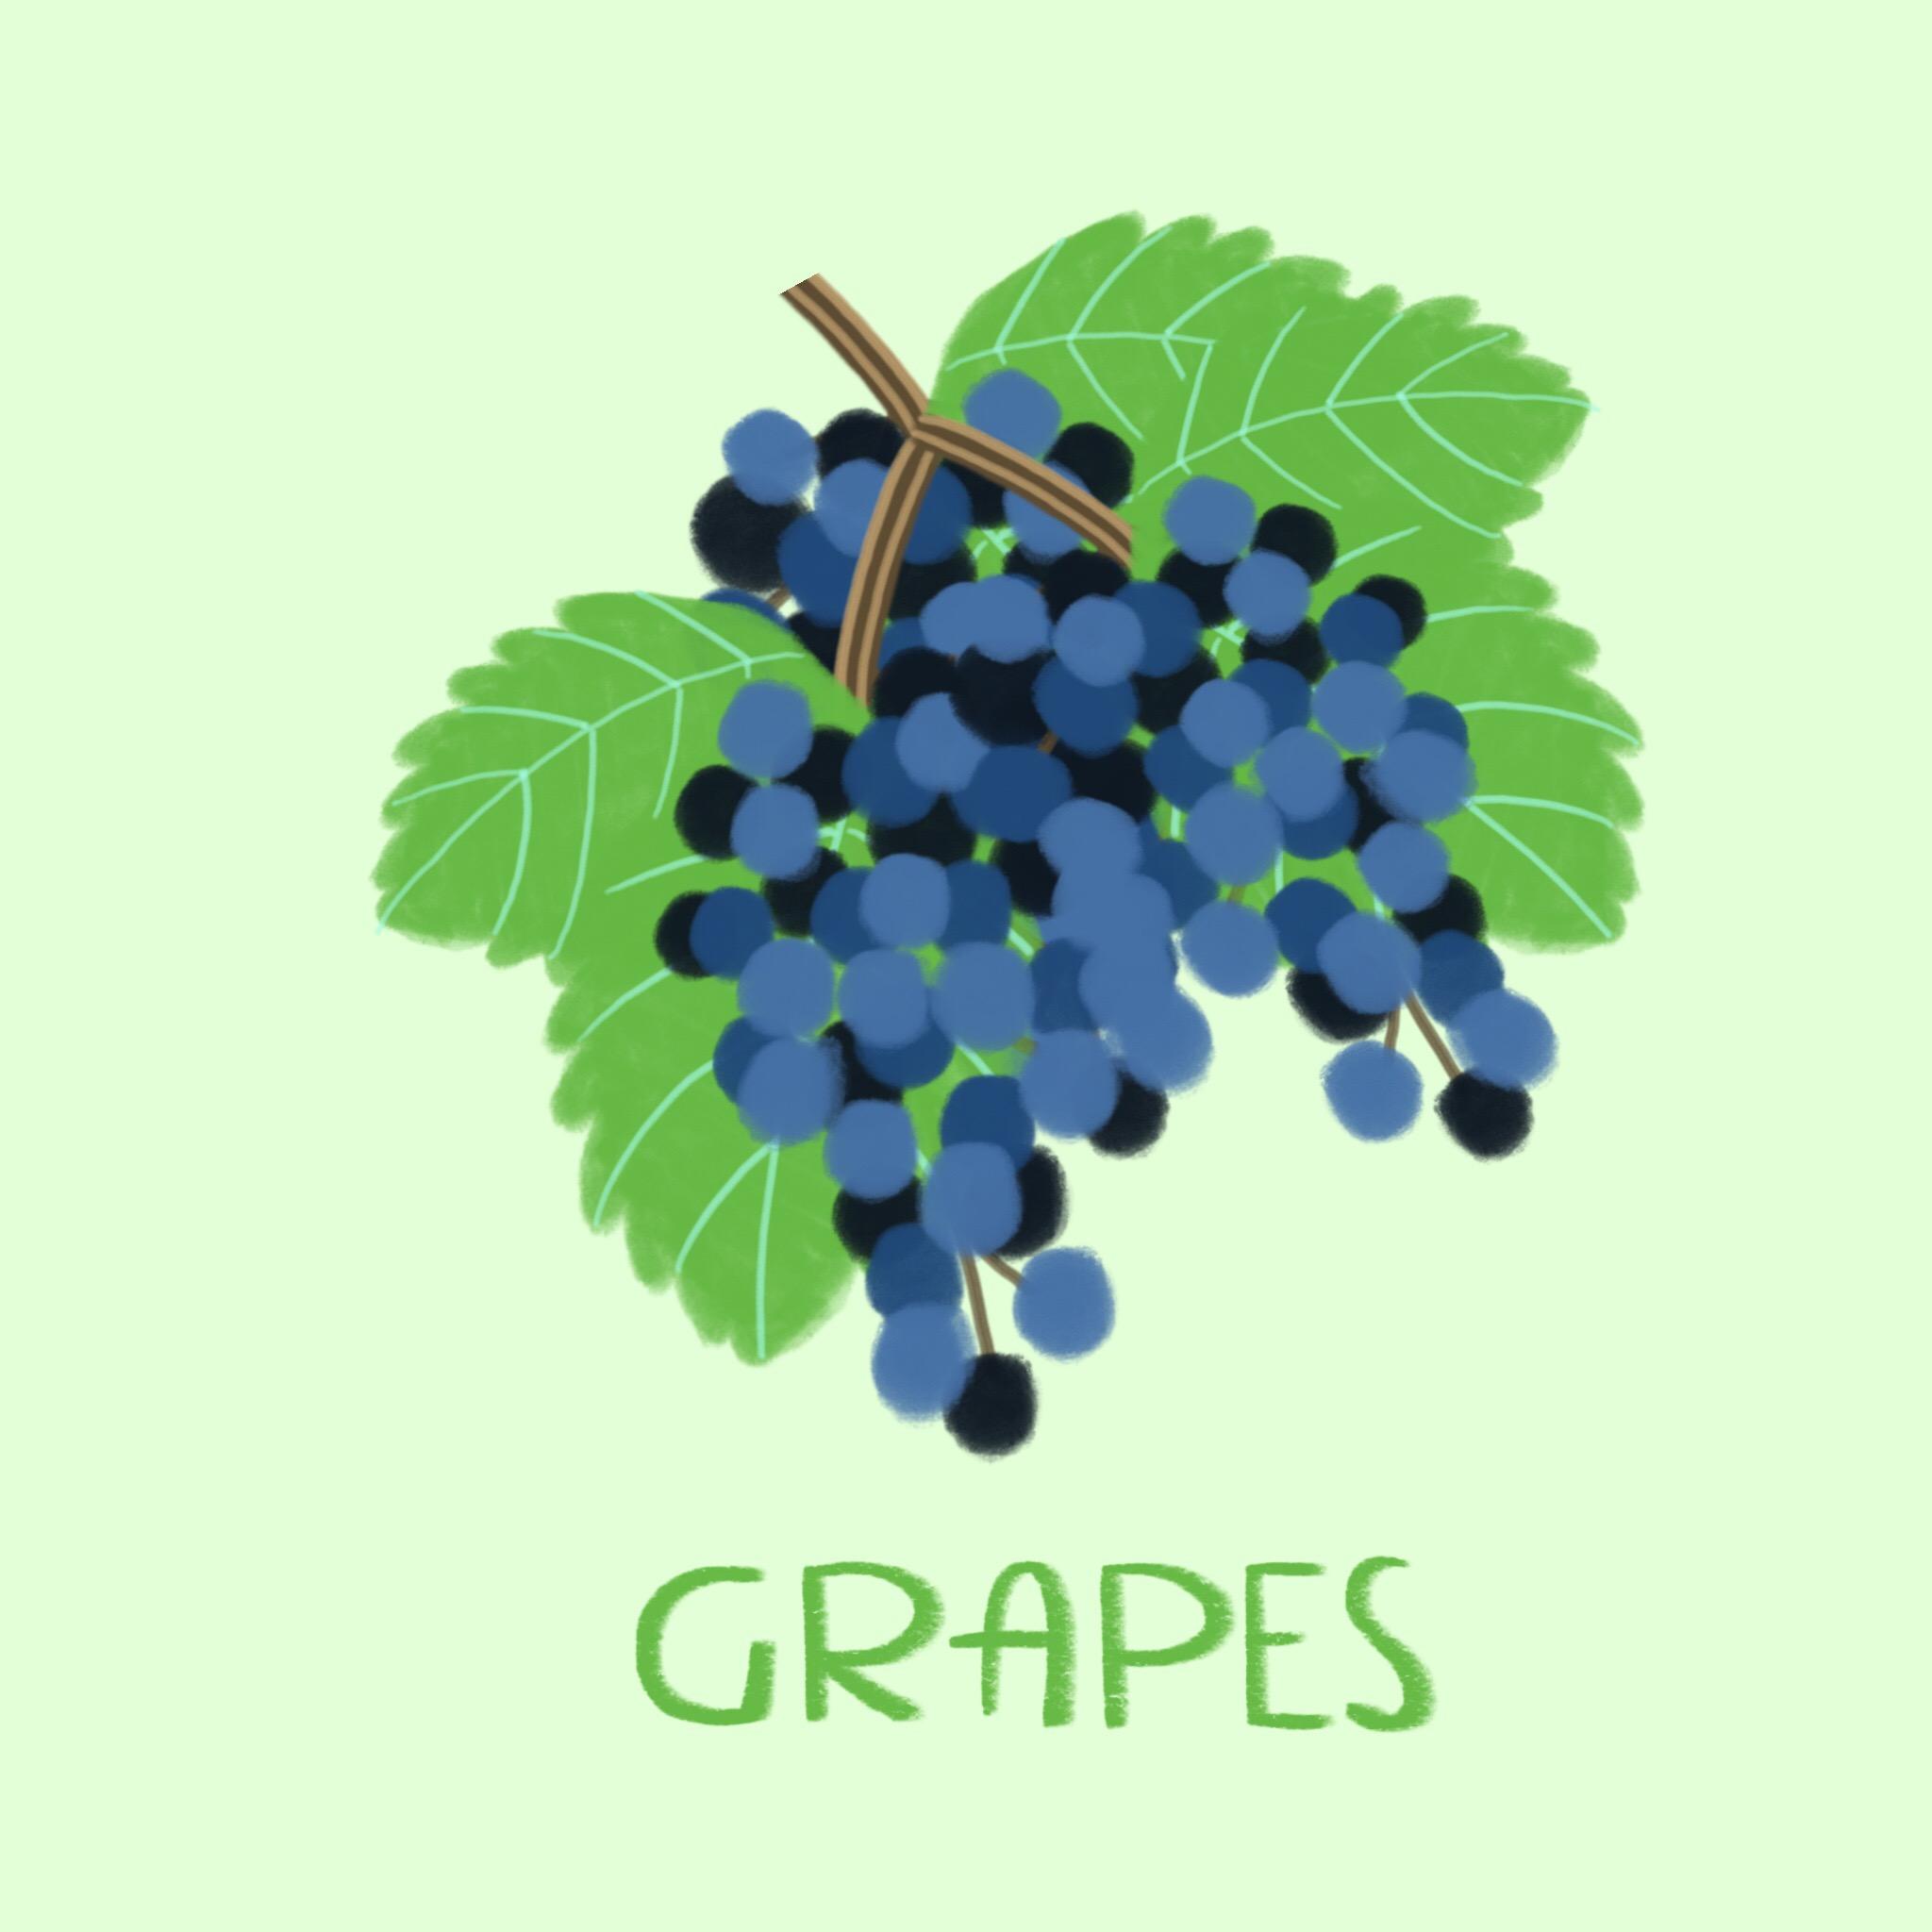 73_-_Grapes (1).jpg